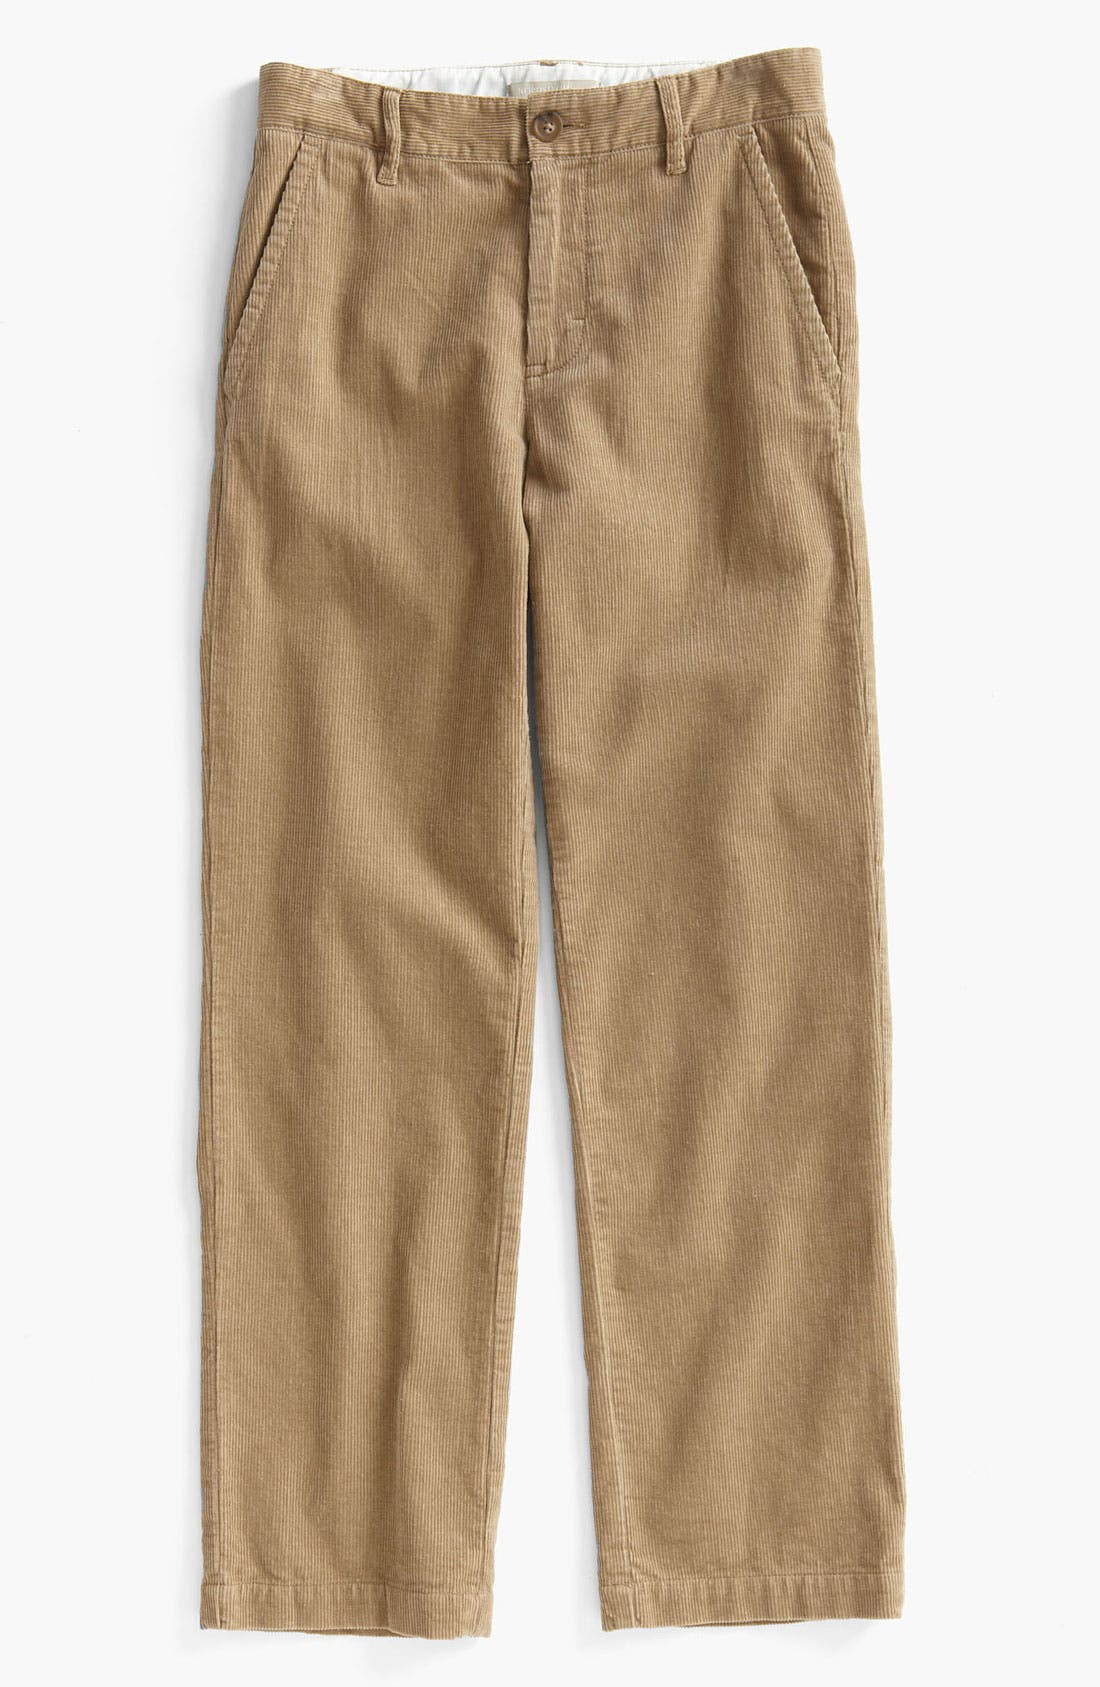 Main Image - Nordstrom 'Edward' Corduroy Trousers (Little Boys)